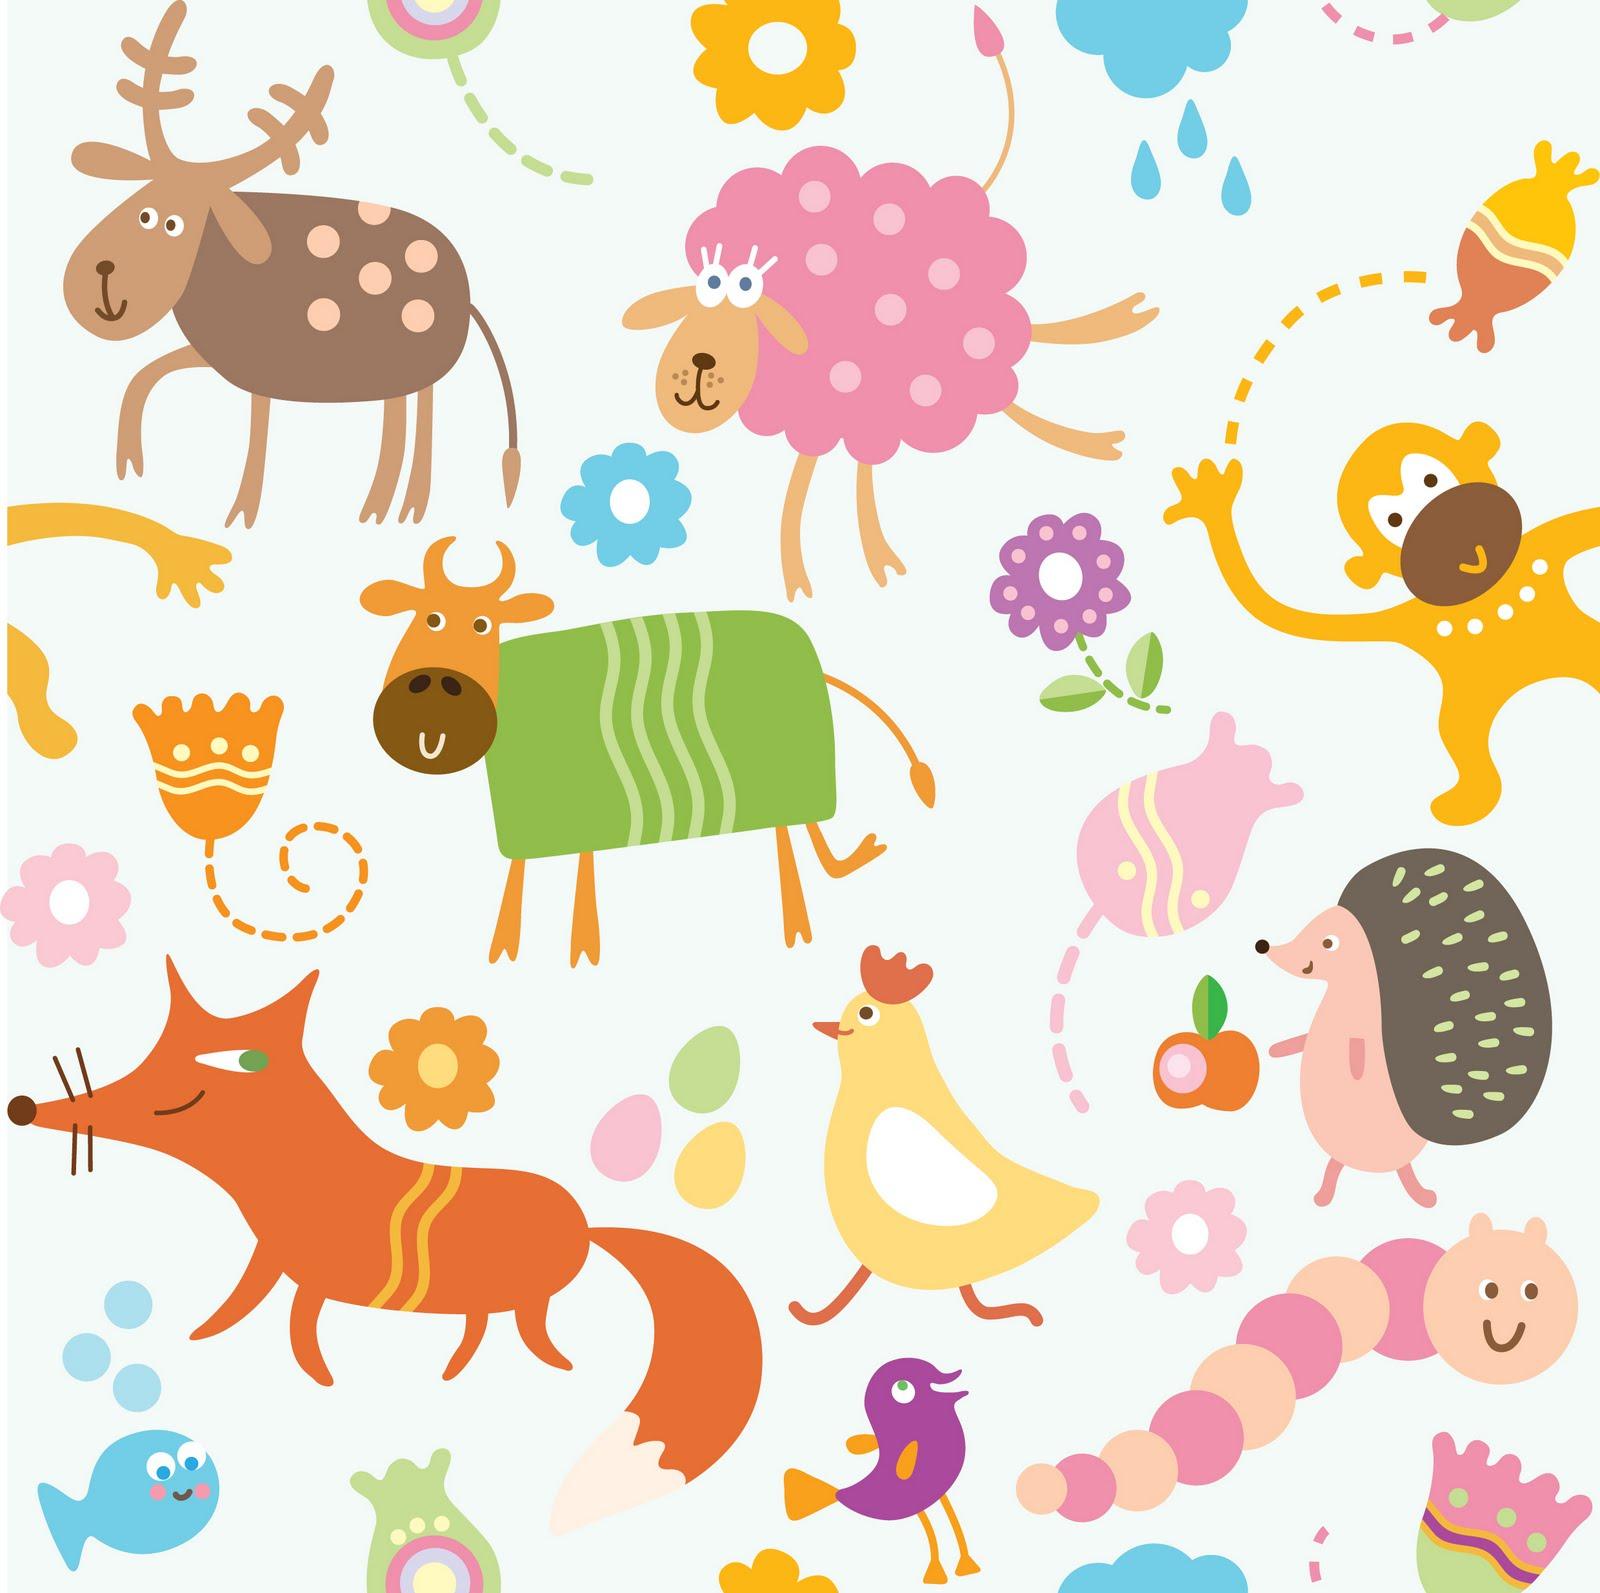 Fondos infantiles de animales fondos de pantalla y mucho m s - Fotos de animales infantiles ...